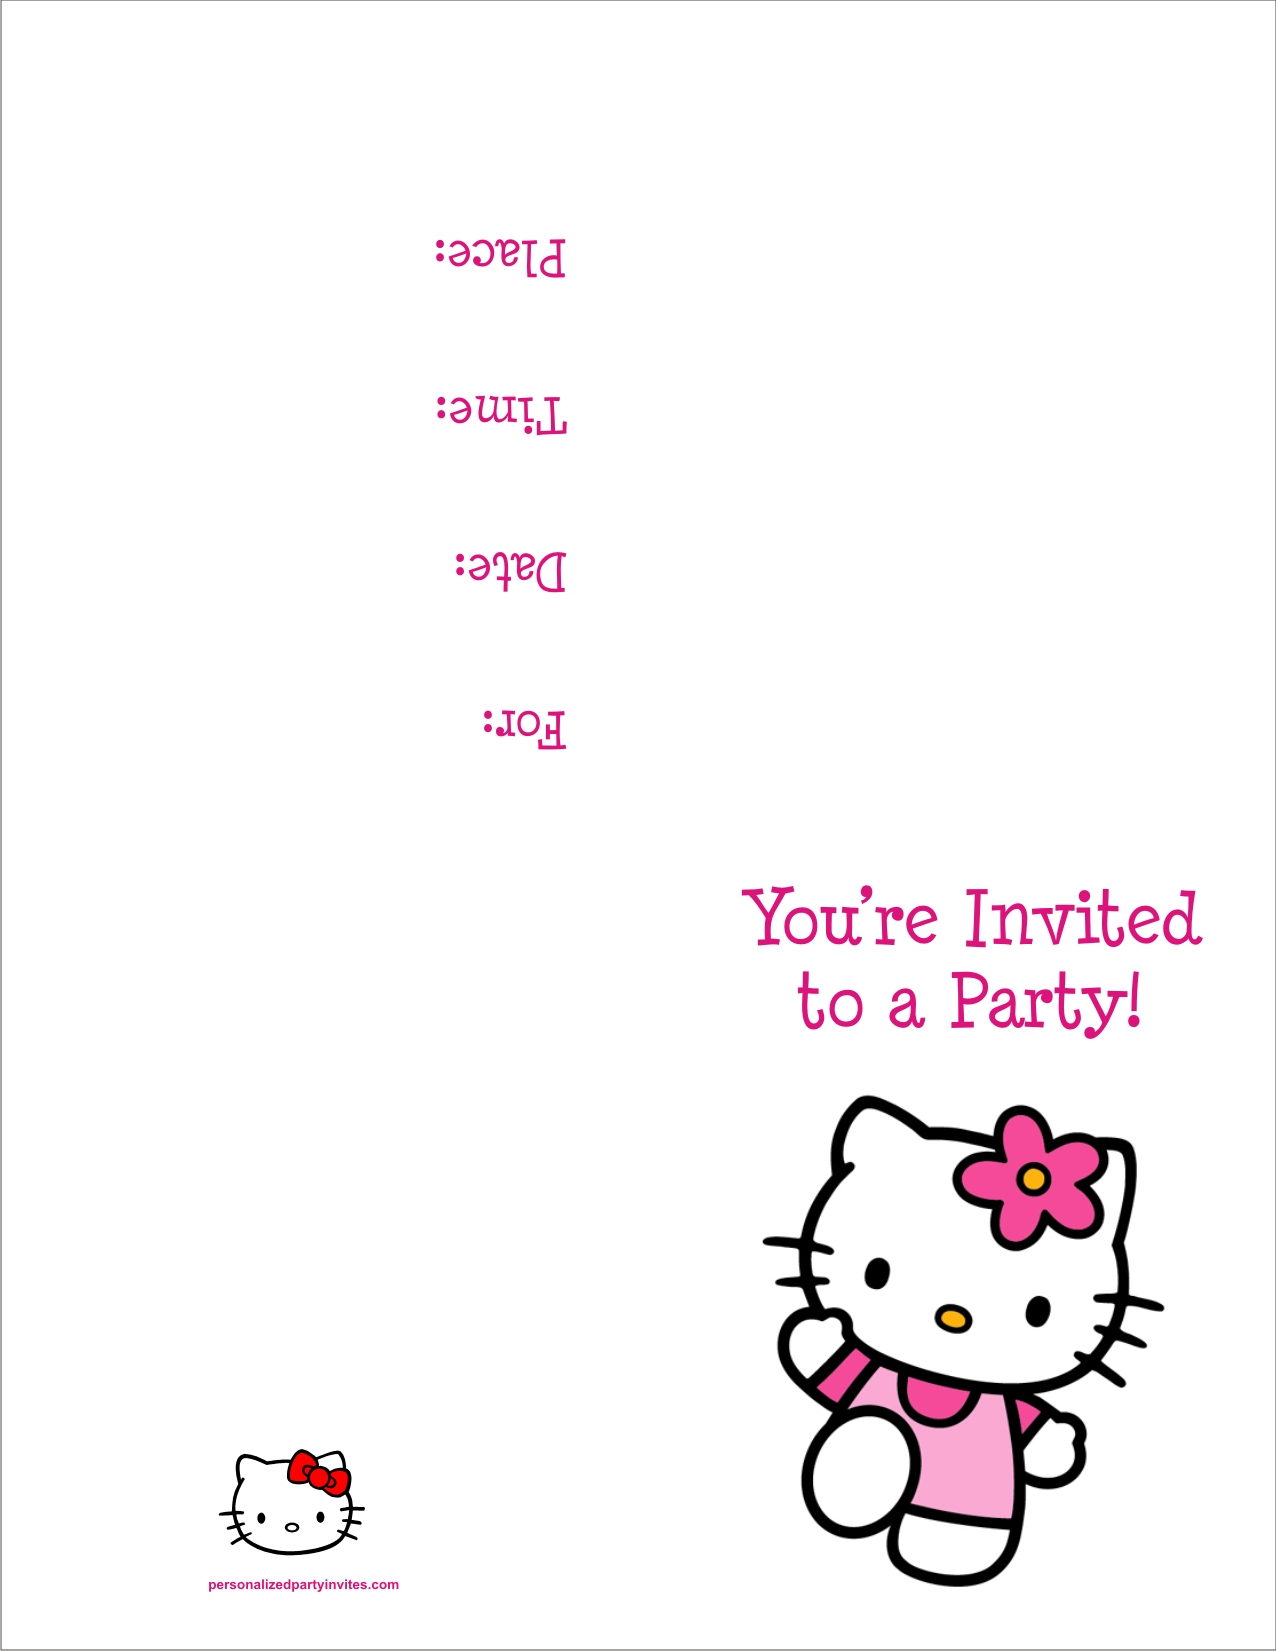 hello kitty free printable birthday party invitation personalized party invites